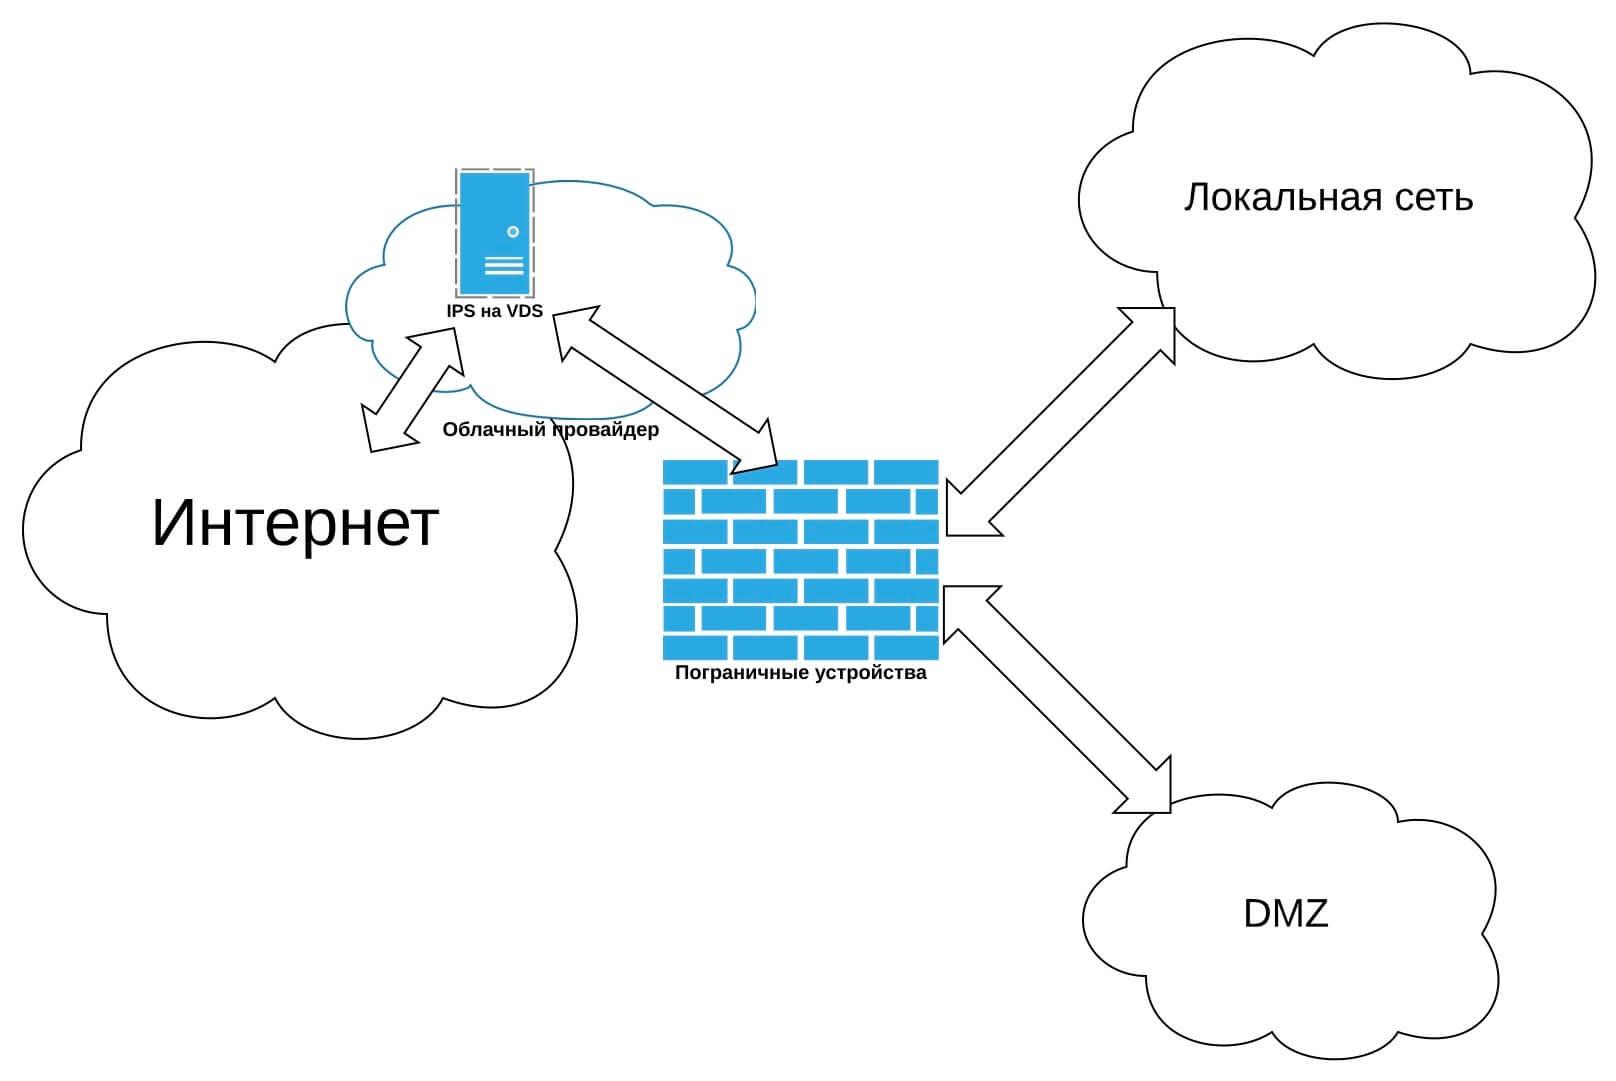 Vmware view - virtual desktop infrastructure - vdi